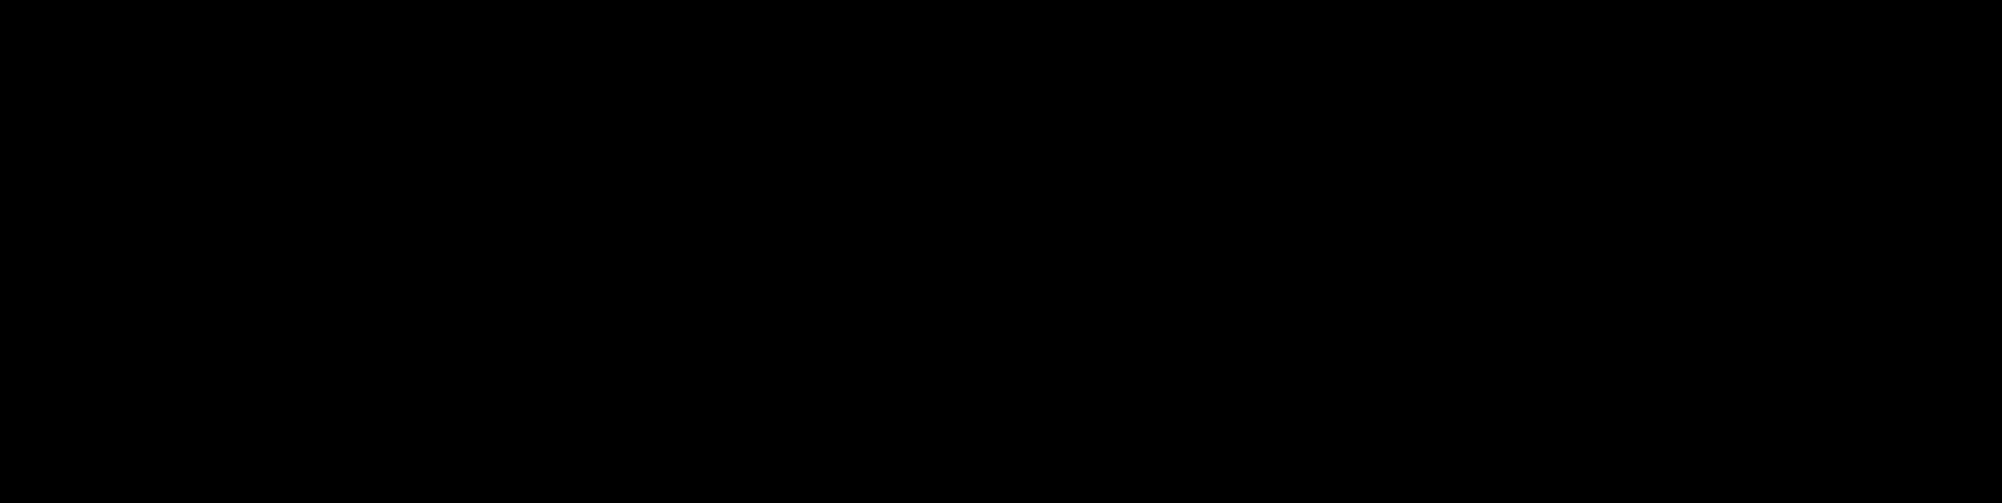 WCM0004